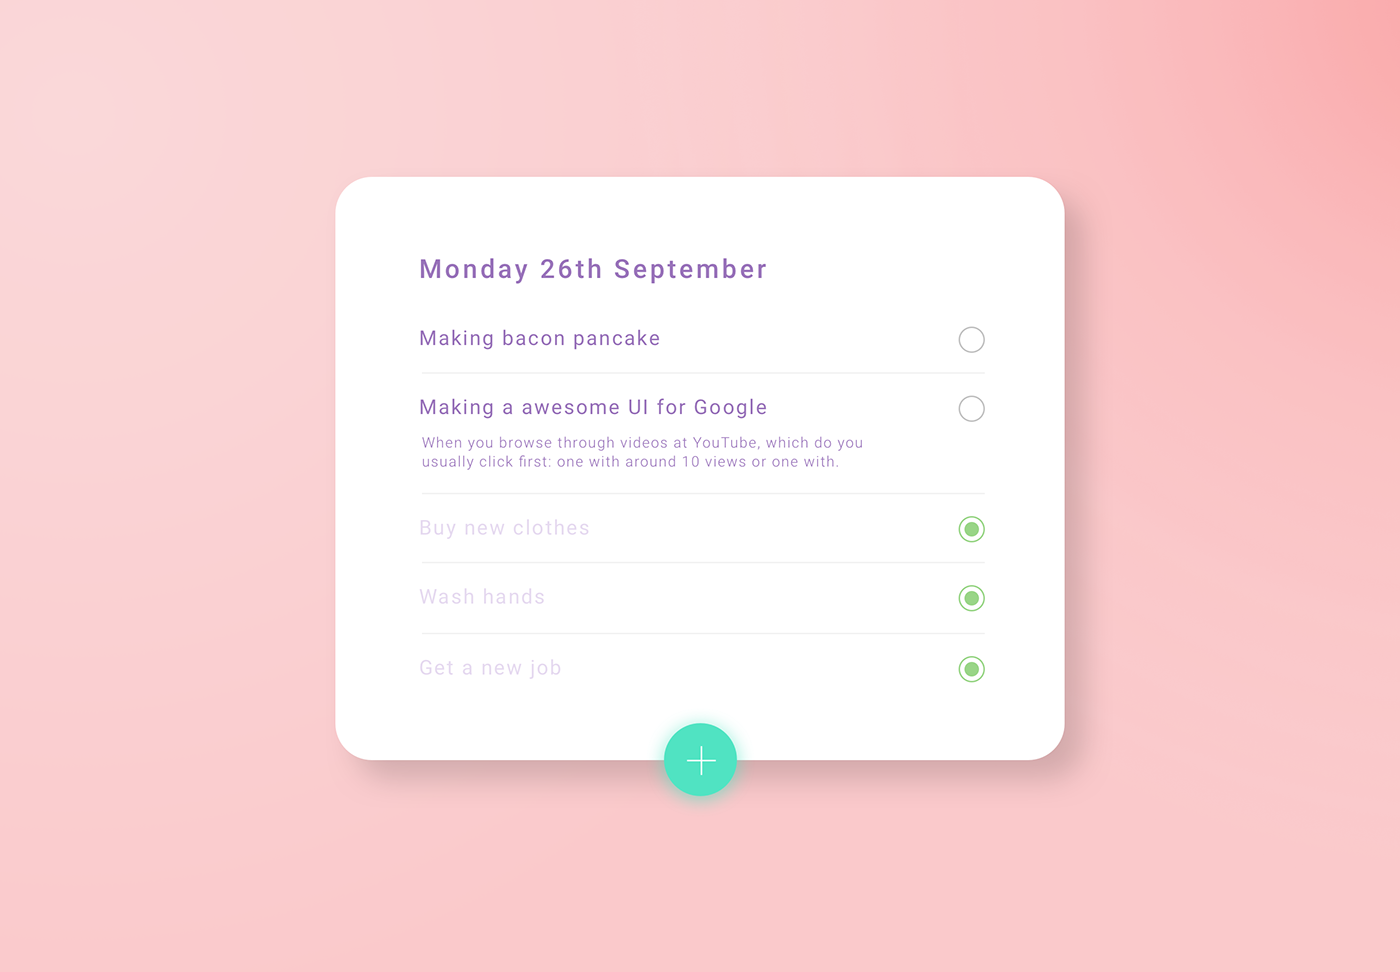 list to do app design material material design daily ui UI ux user interface